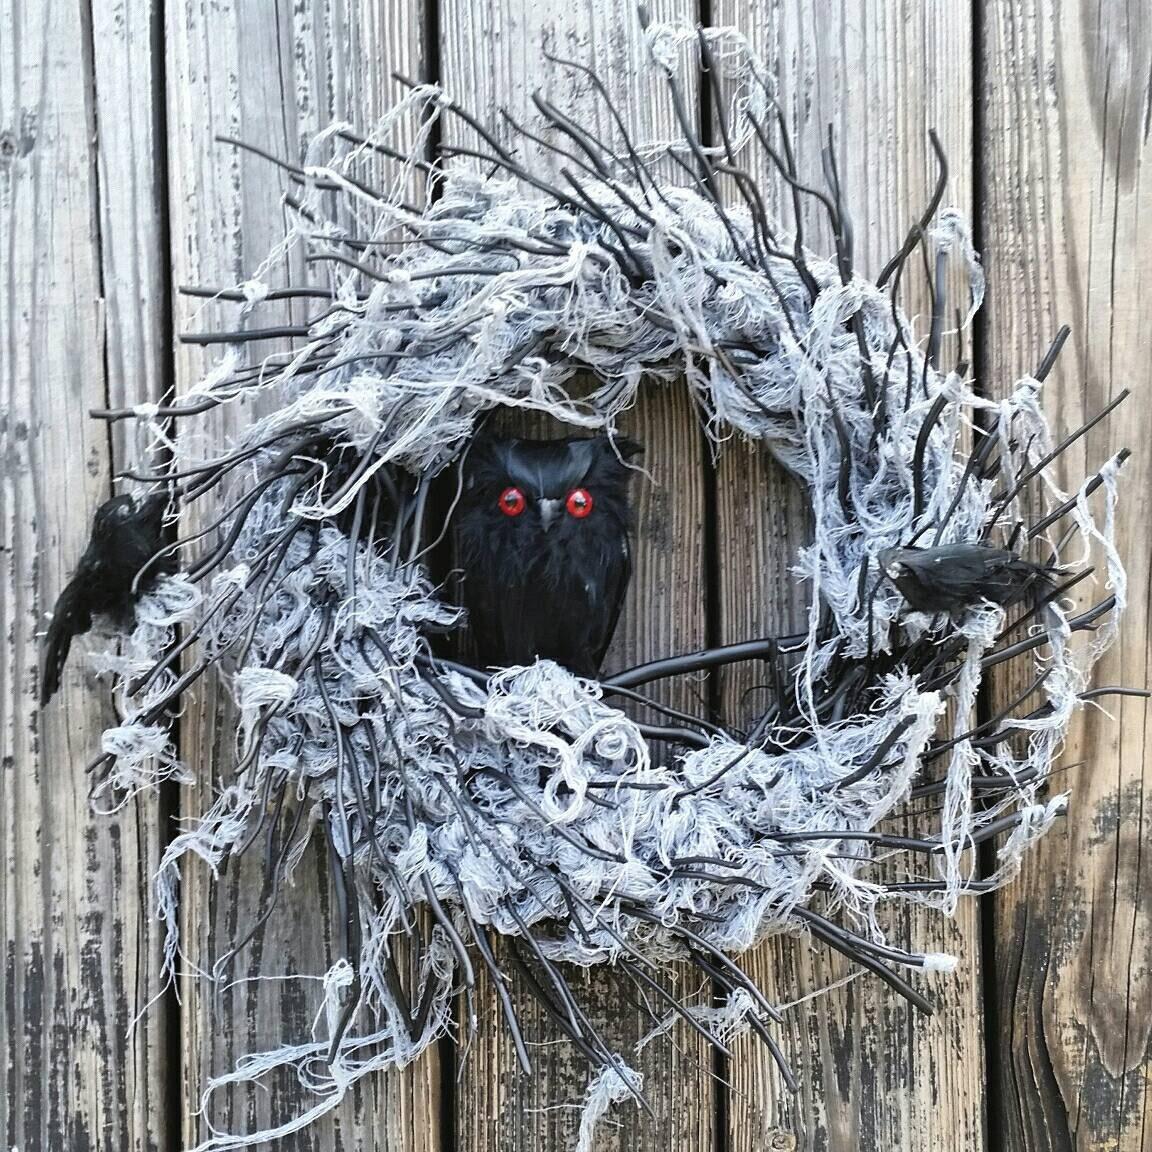 Black Flower And Crow Halloween Wreath: Halloween Wreath Gossamer Black Twig Wreath